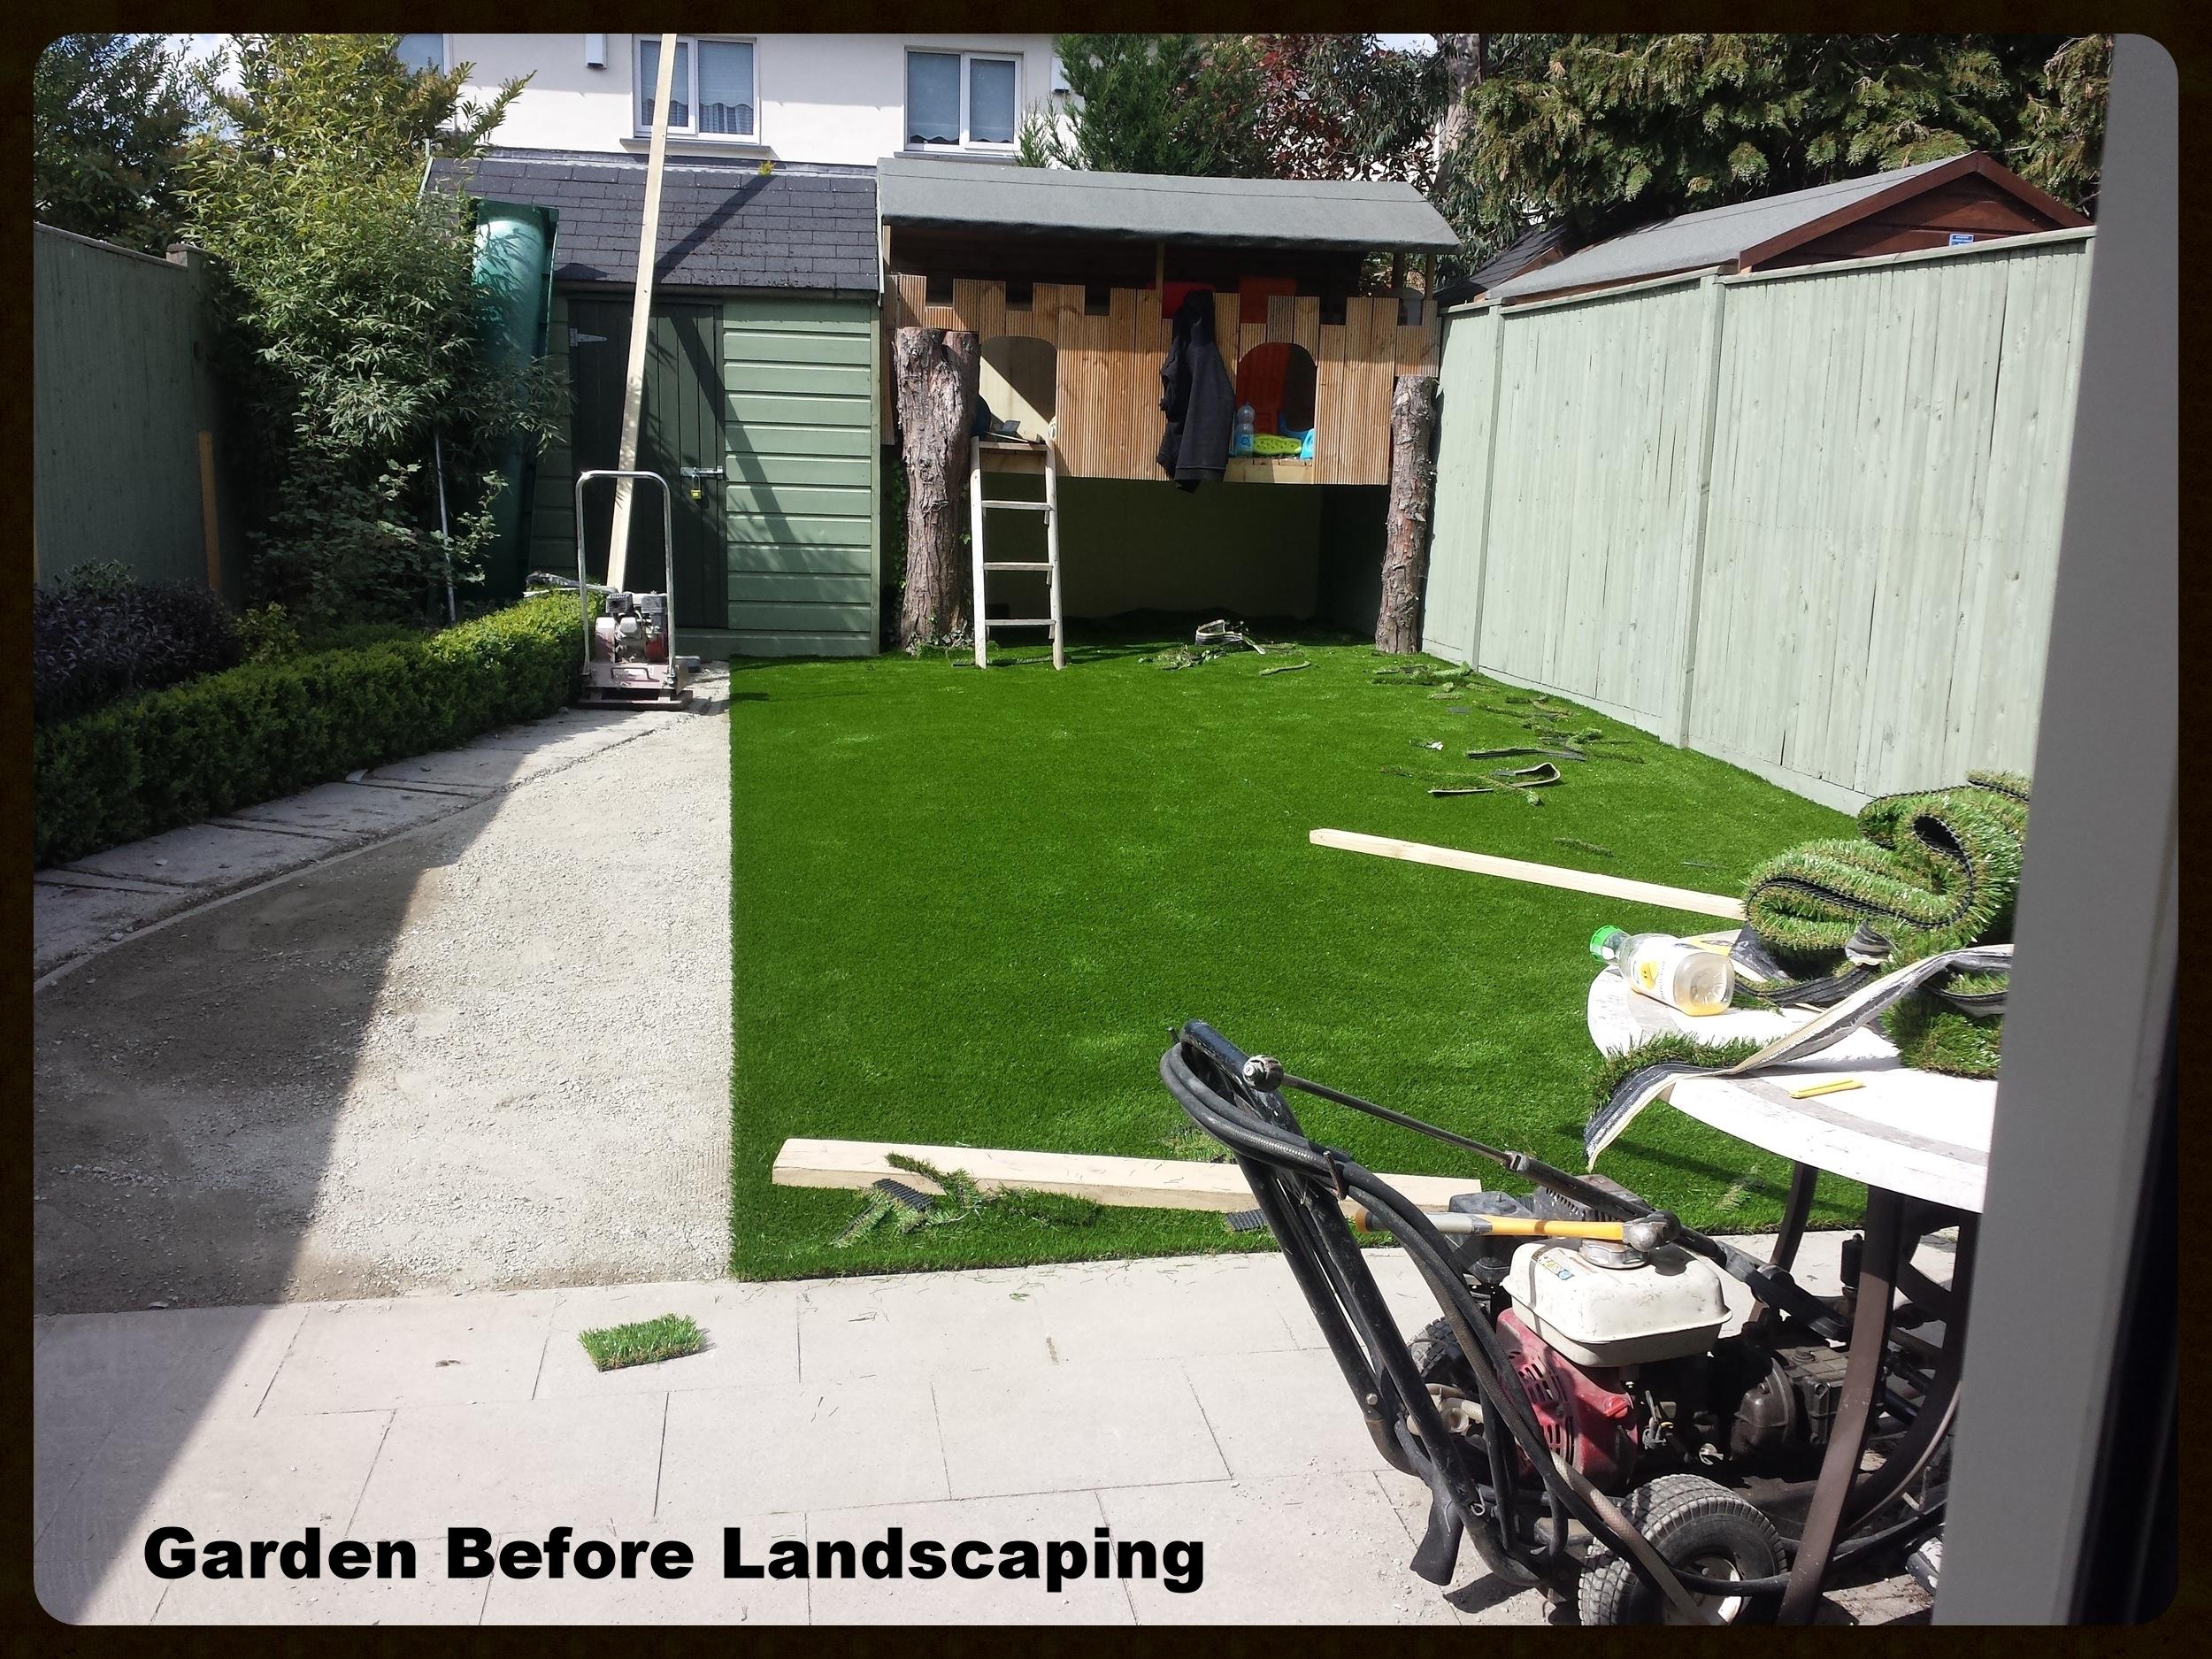 Garden during landscaping